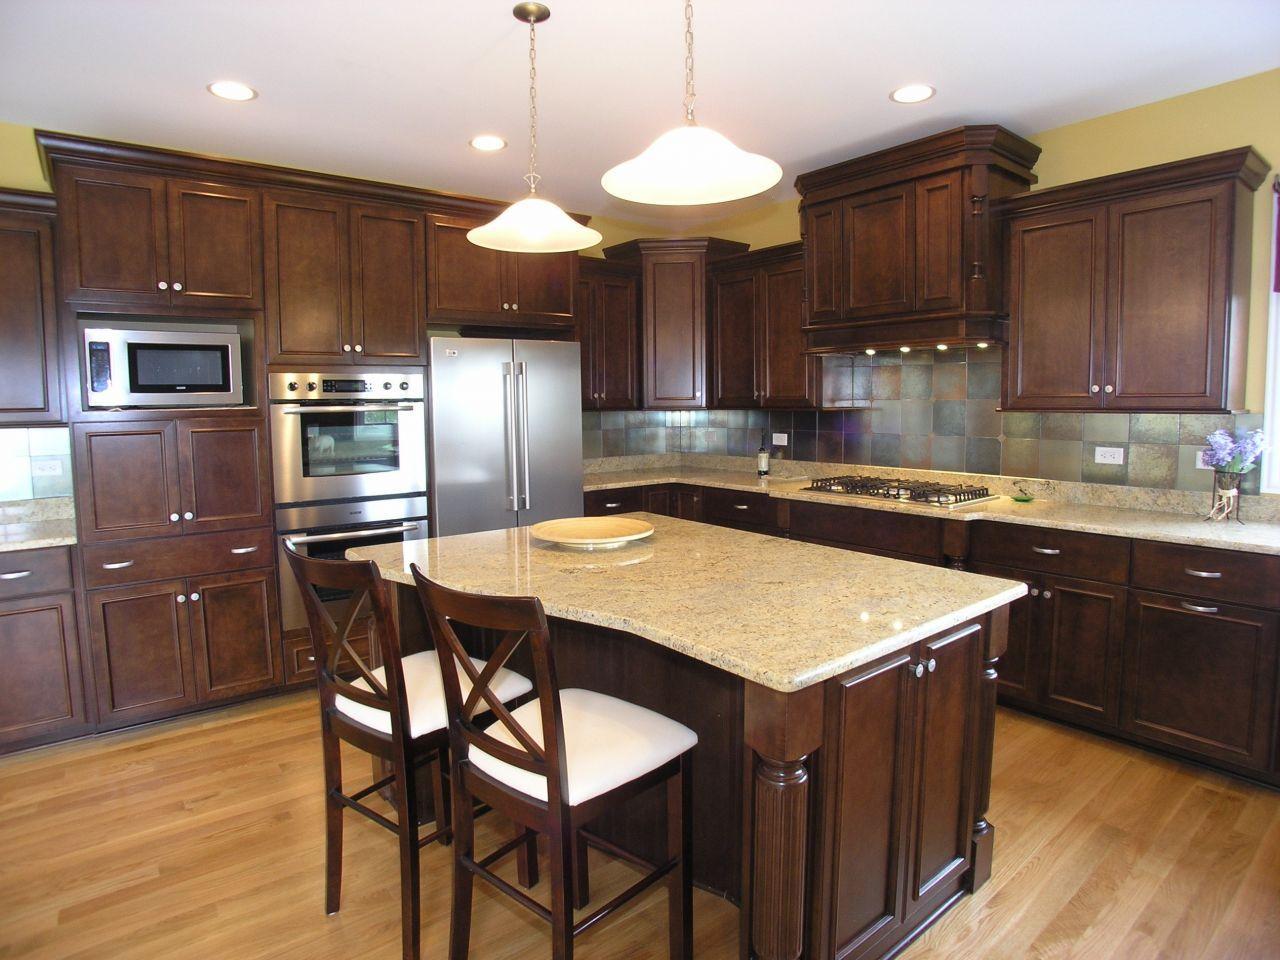 White Kitchen Countertops Dark Cabinets Granite Kashmir White Kitchen Dark Cabinets Stone Island Neutral